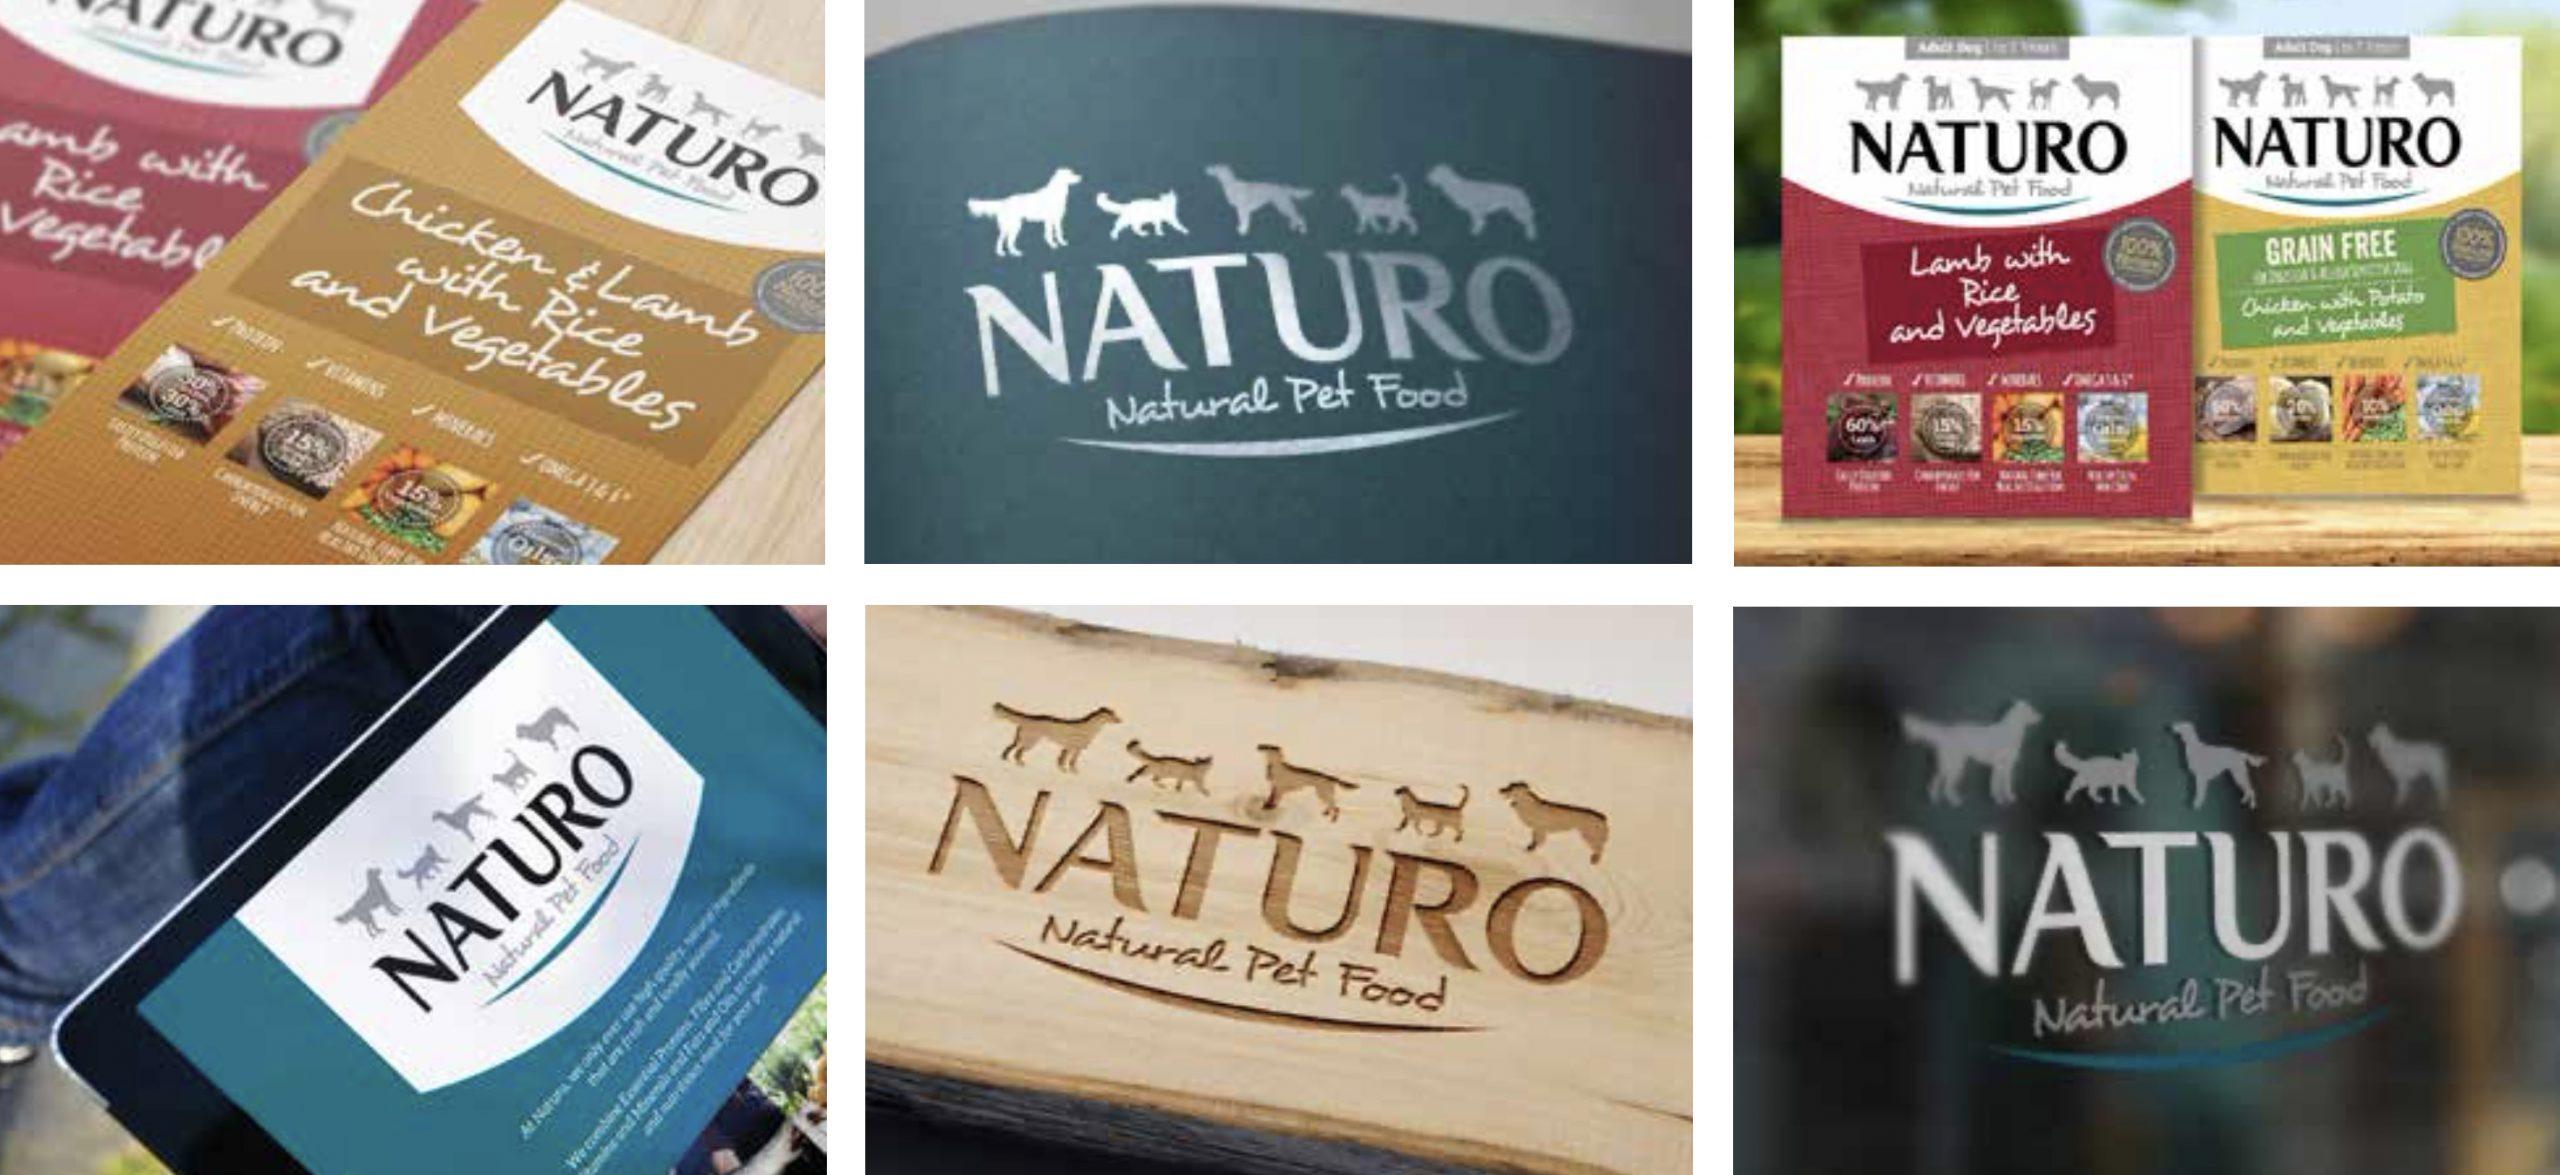 naturo_logos